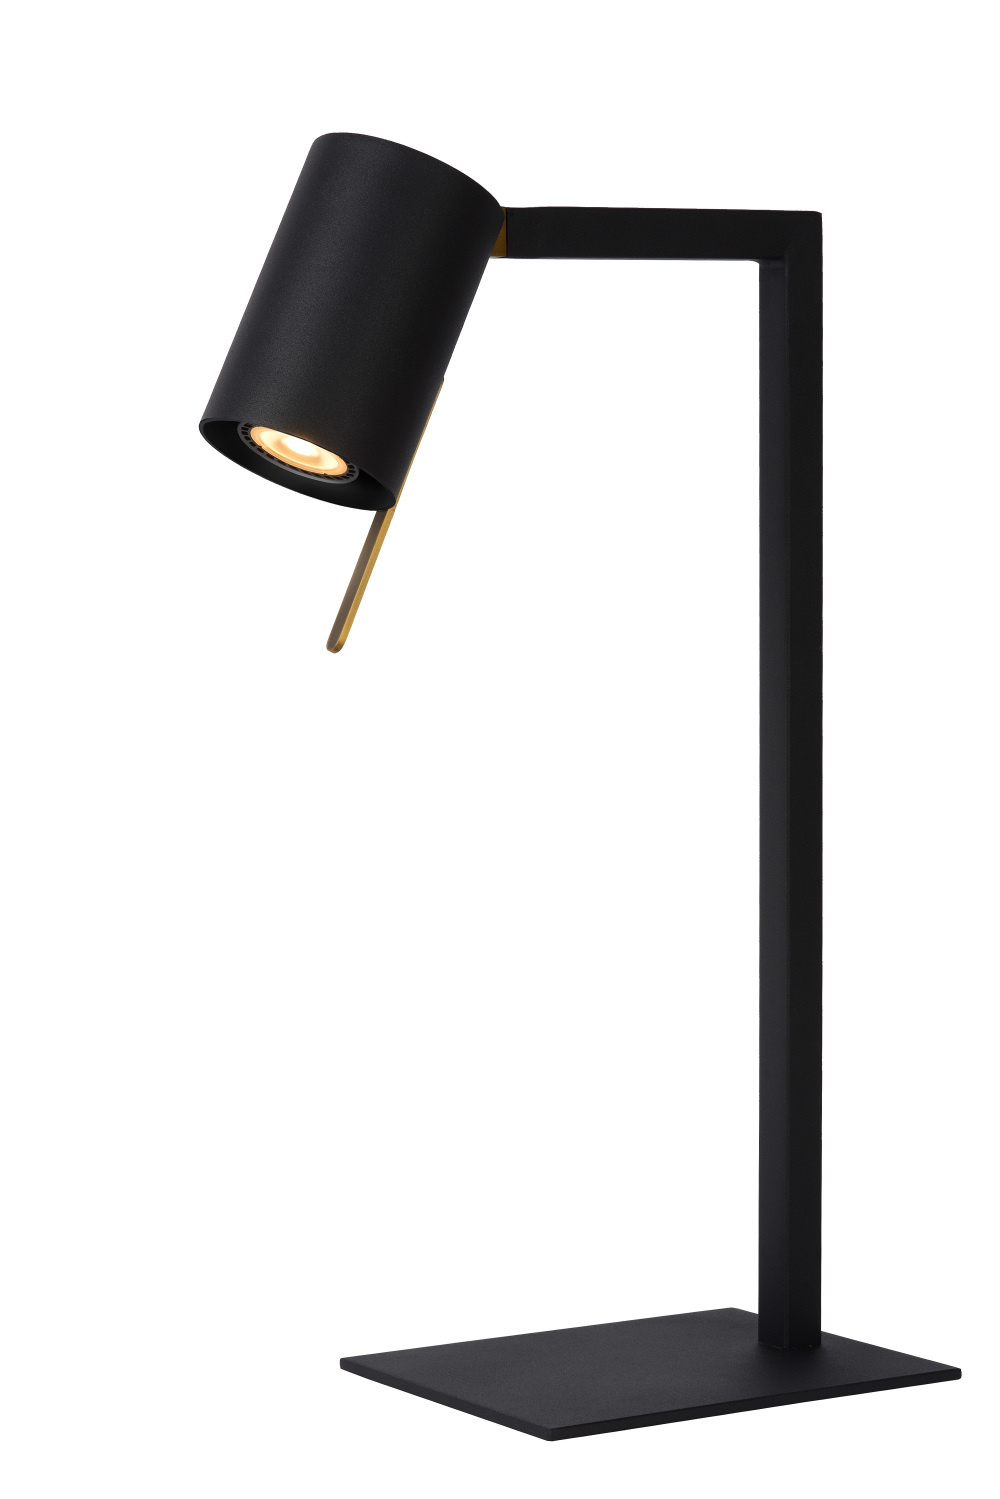 Lucide LESLEY Bureaulamp-Zwart-1xGU10-35W-Metaal